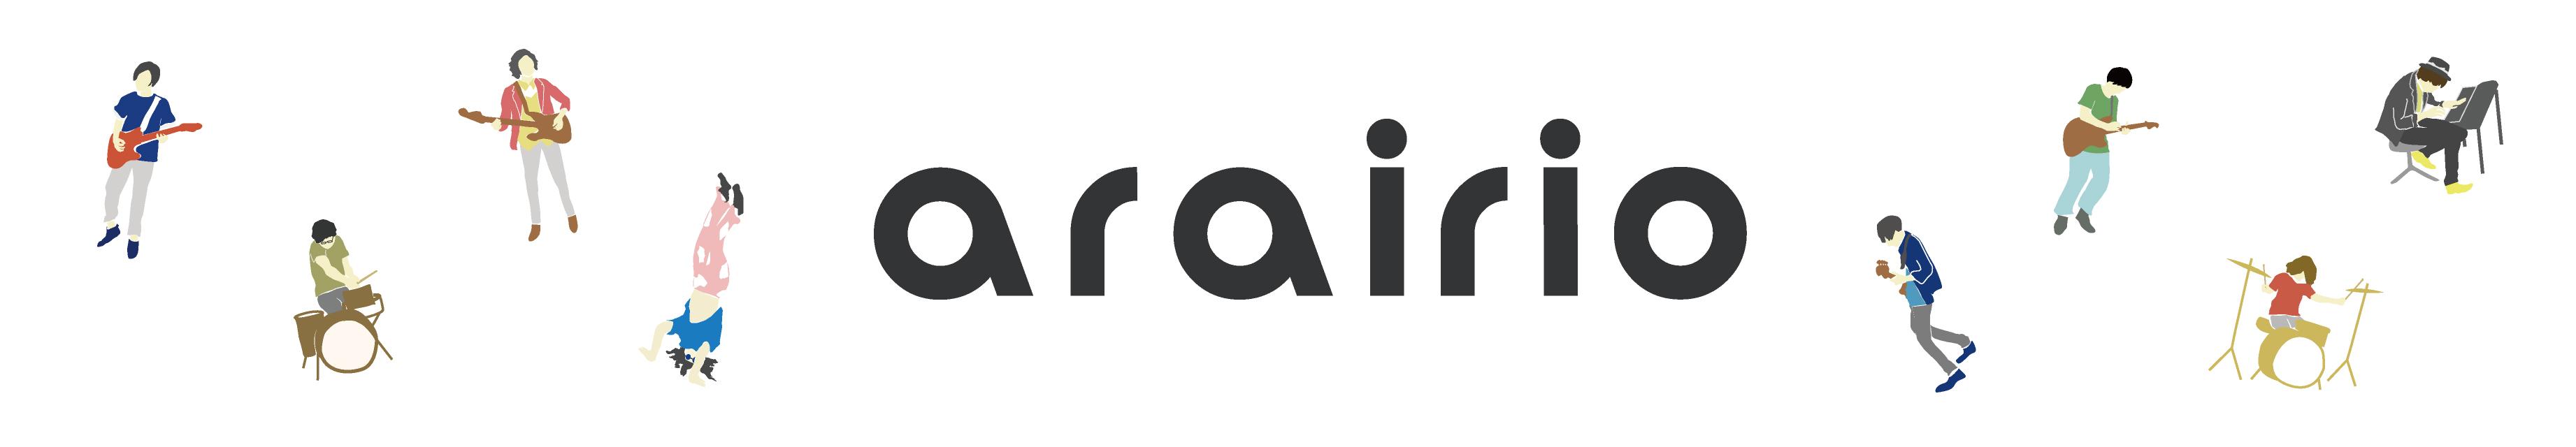 arairio.com - 新井リオのBLOG